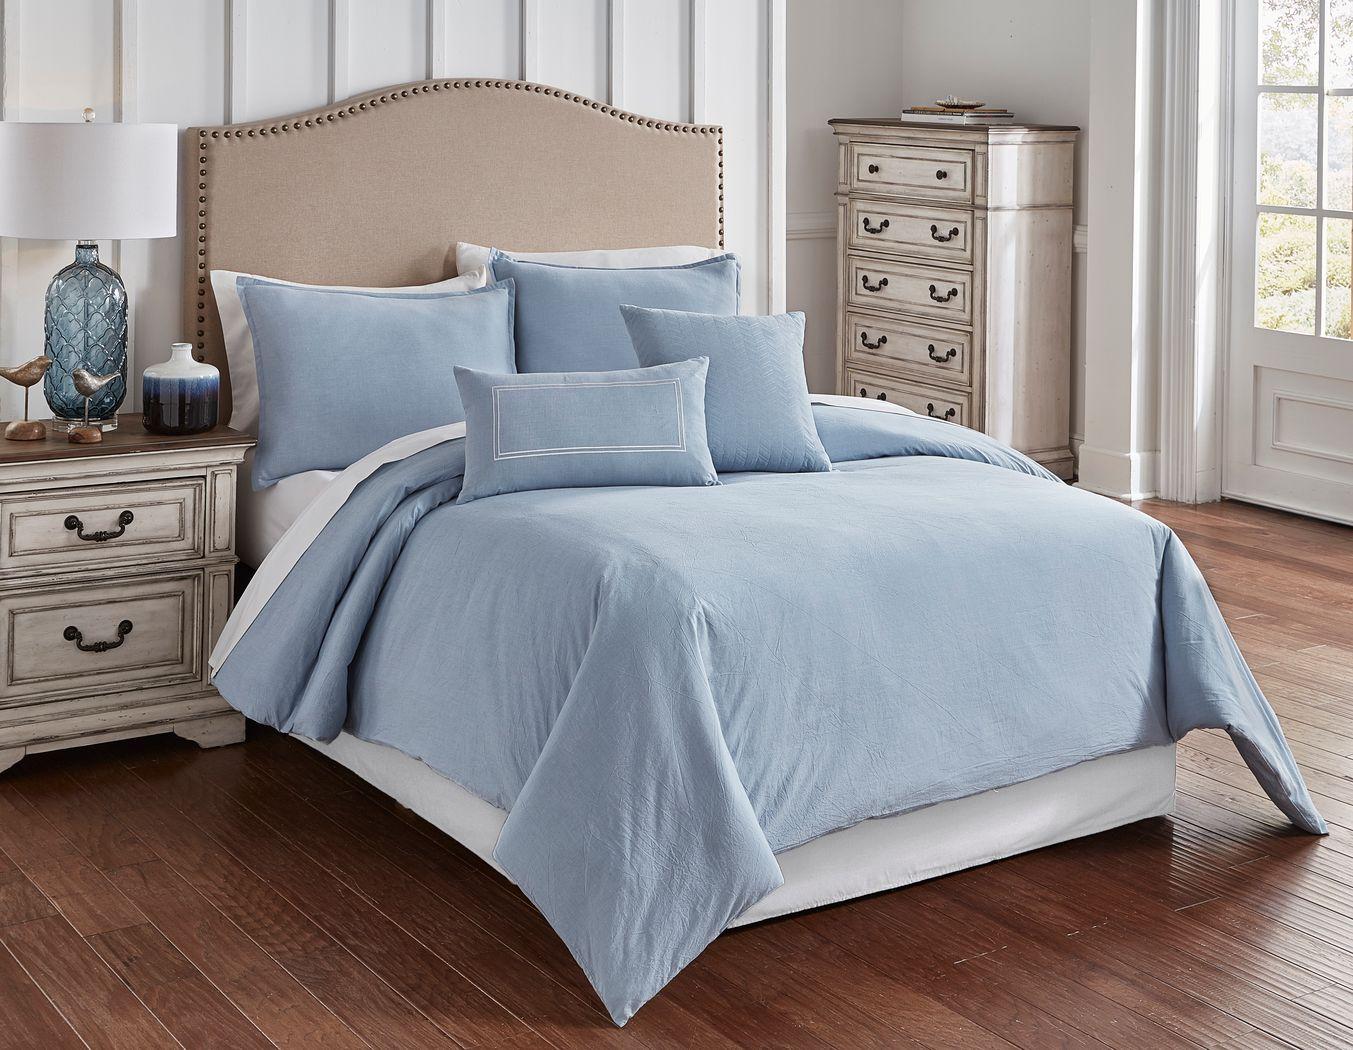 Nevan Blue 5 Pc King Comforter Set